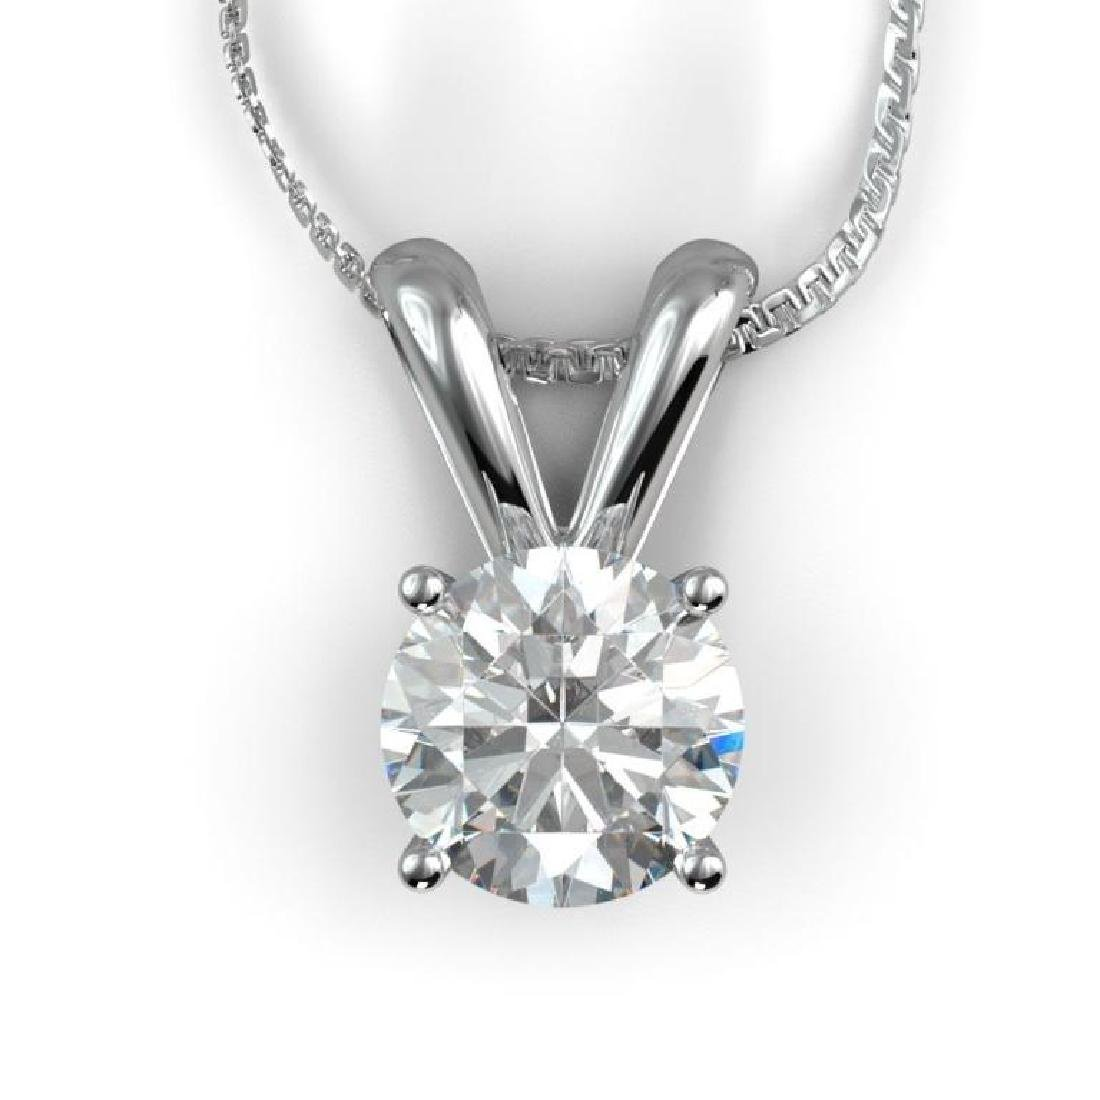 1.6ct Round Diamond & 14kt White Gold Necklace